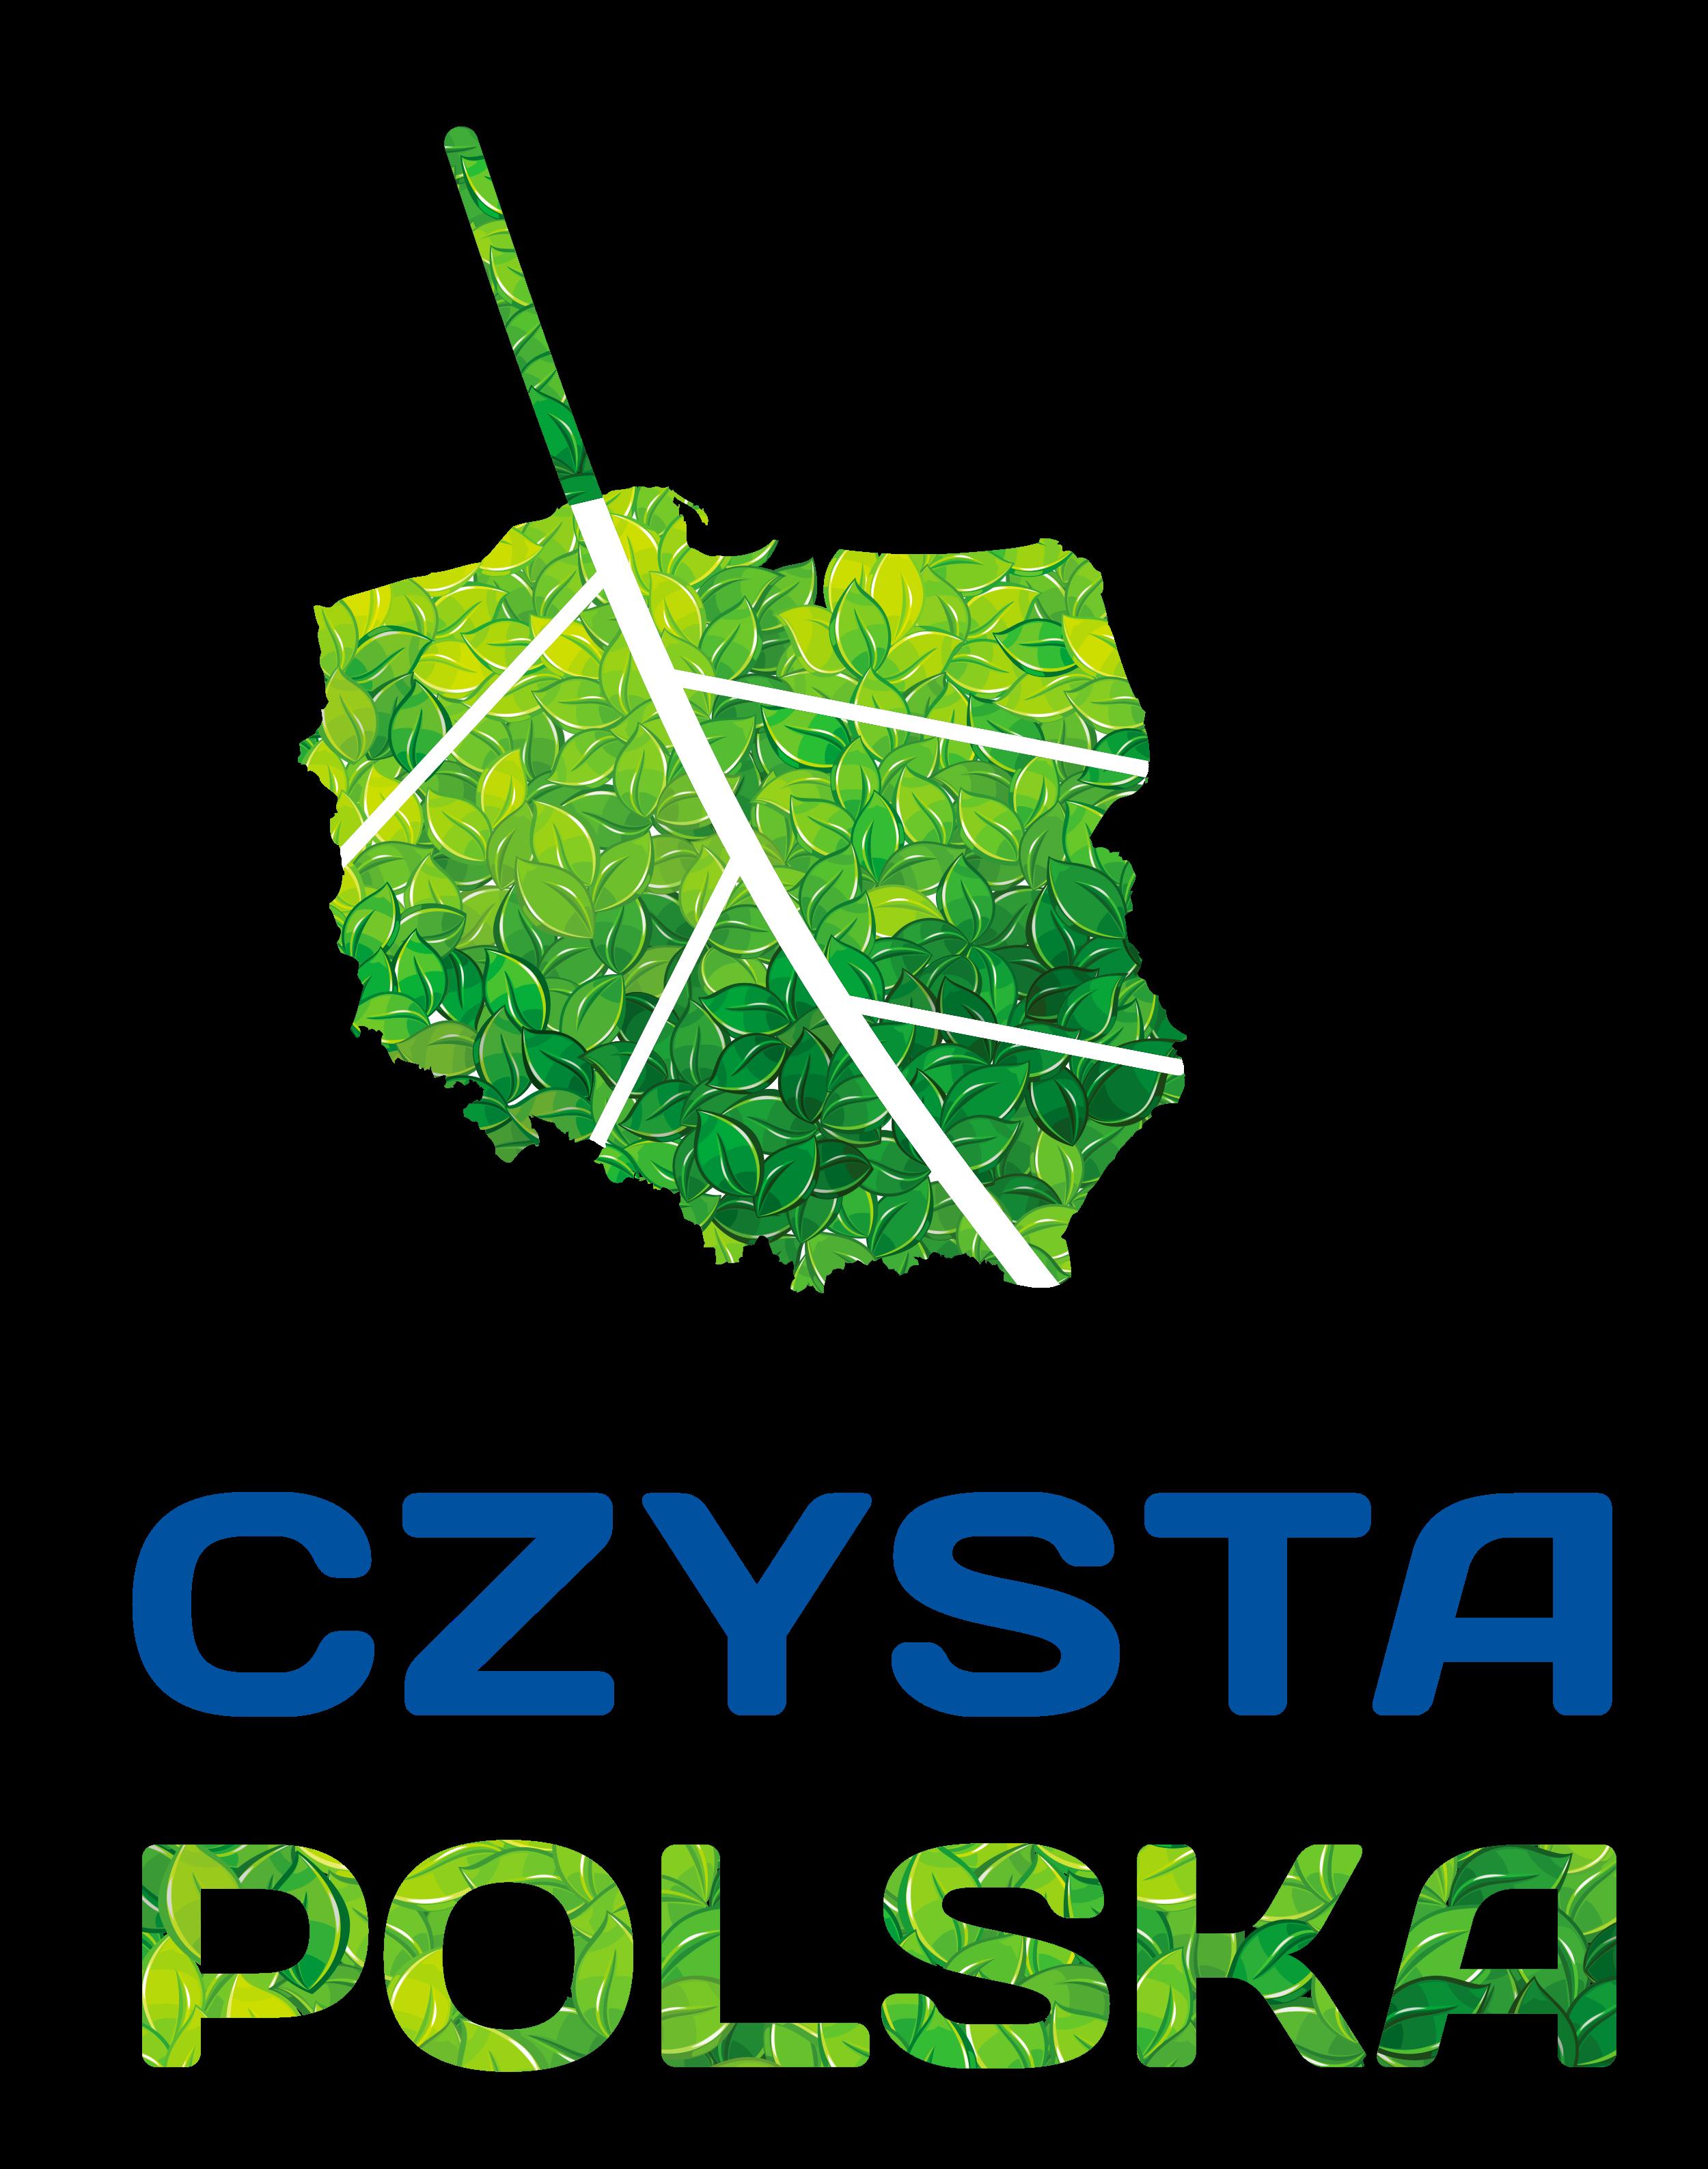 czysta polska logo pion